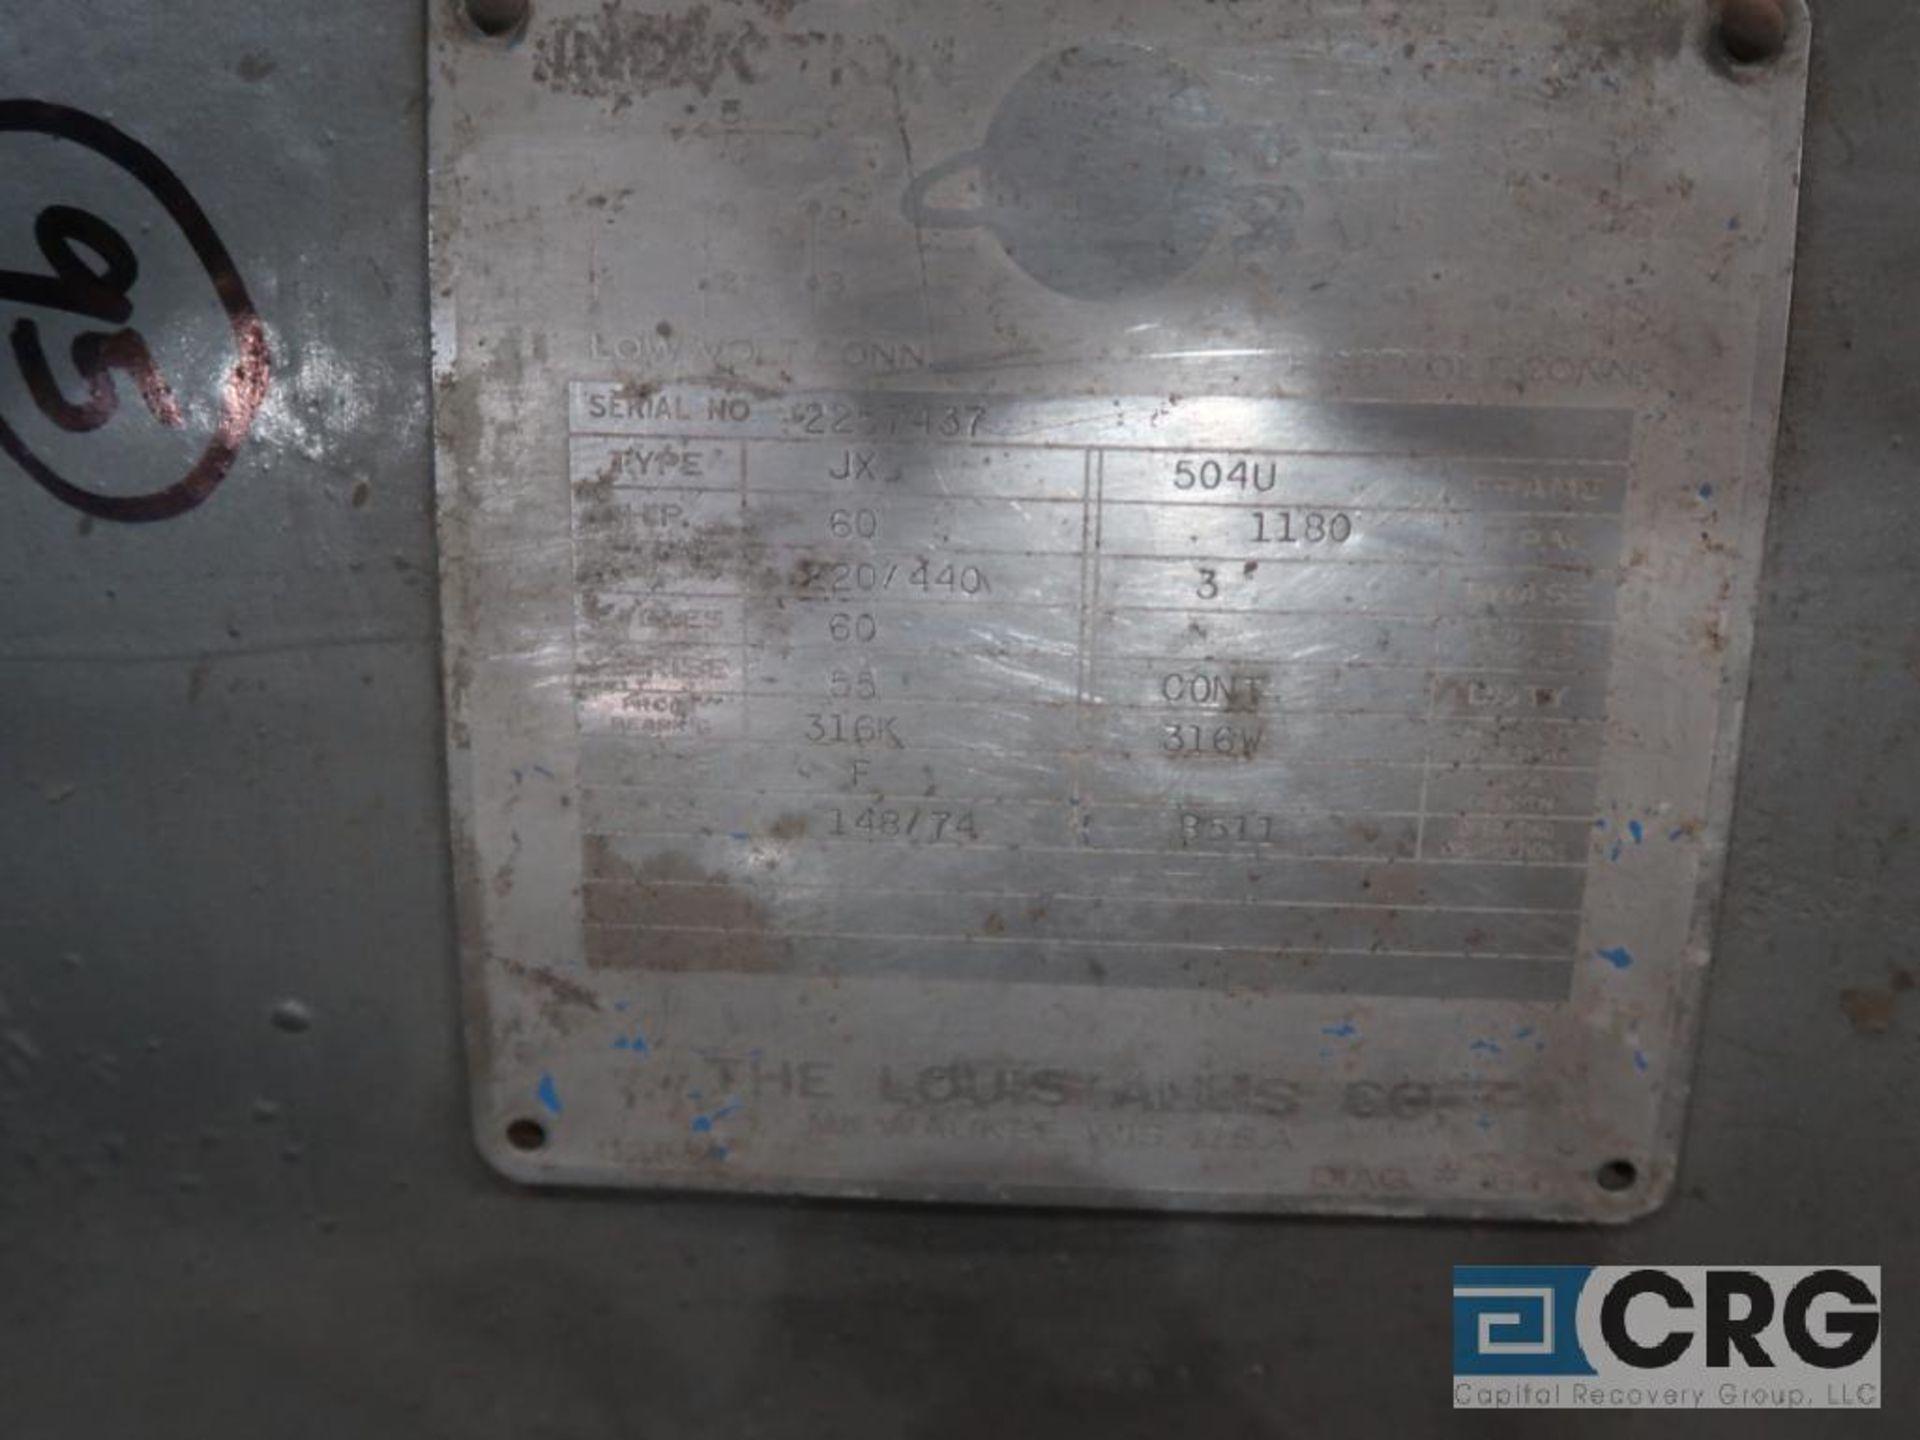 Louis-Allis induction motor, 60 HP, 1,180 RPMs, 220/440 volt, 3 ph., 504U frame (Finish Building) - Image 2 of 2